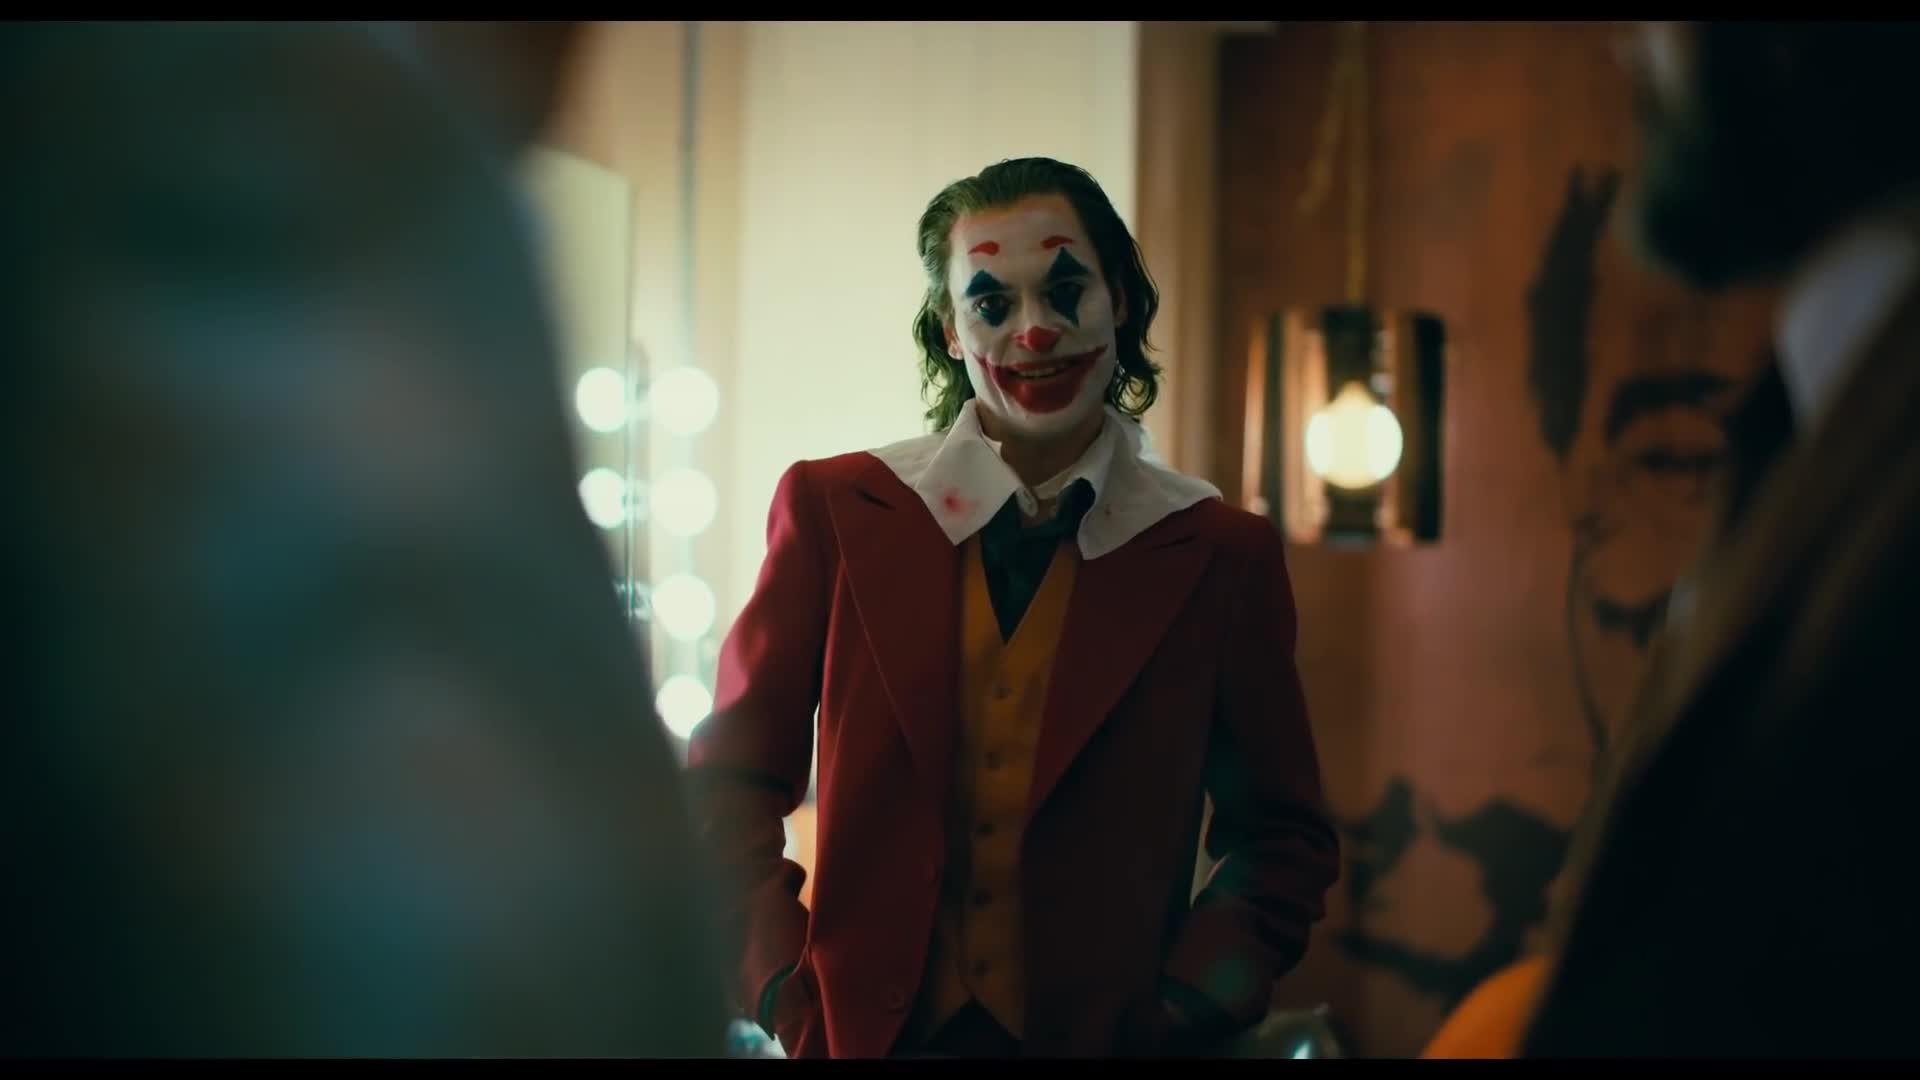 Trailer, Kino, Kinofilm, Warner Bros., DC Comics, DC, Joker